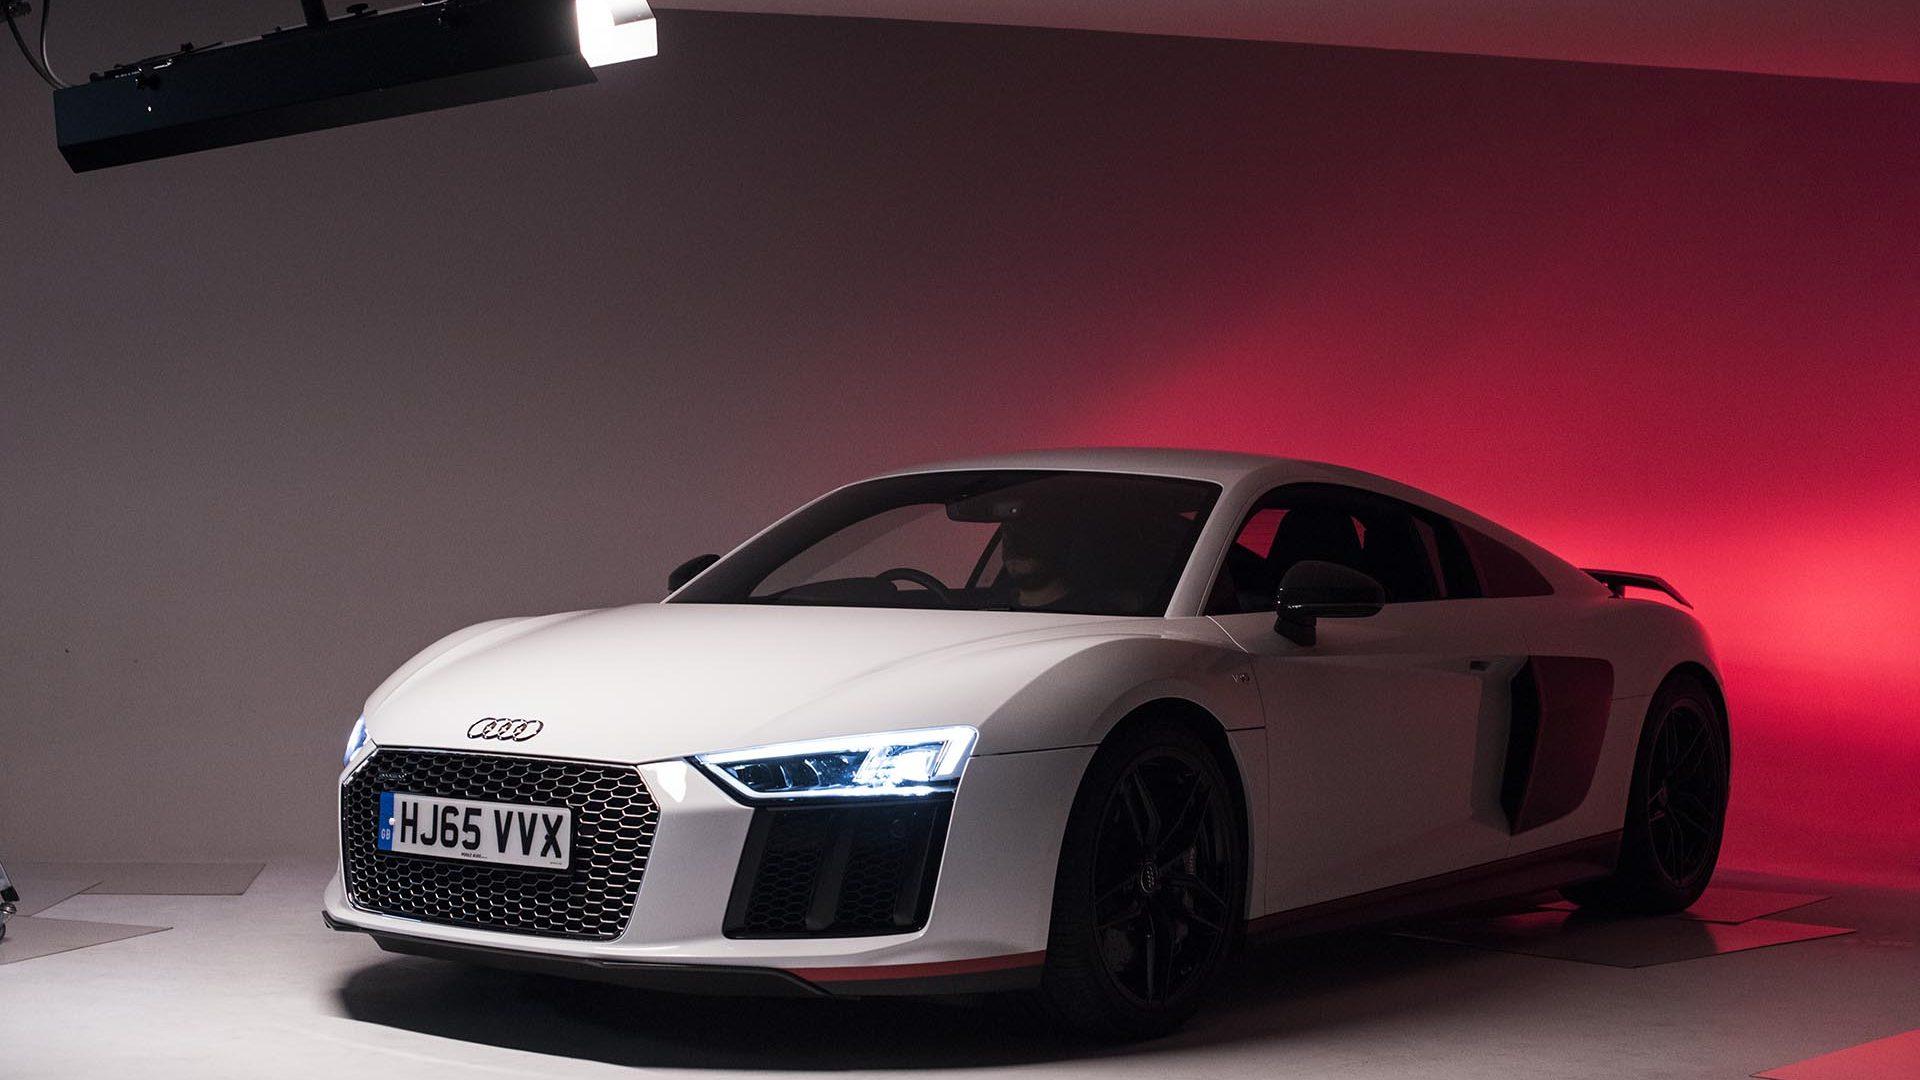 Audi Poole – Shoot 4